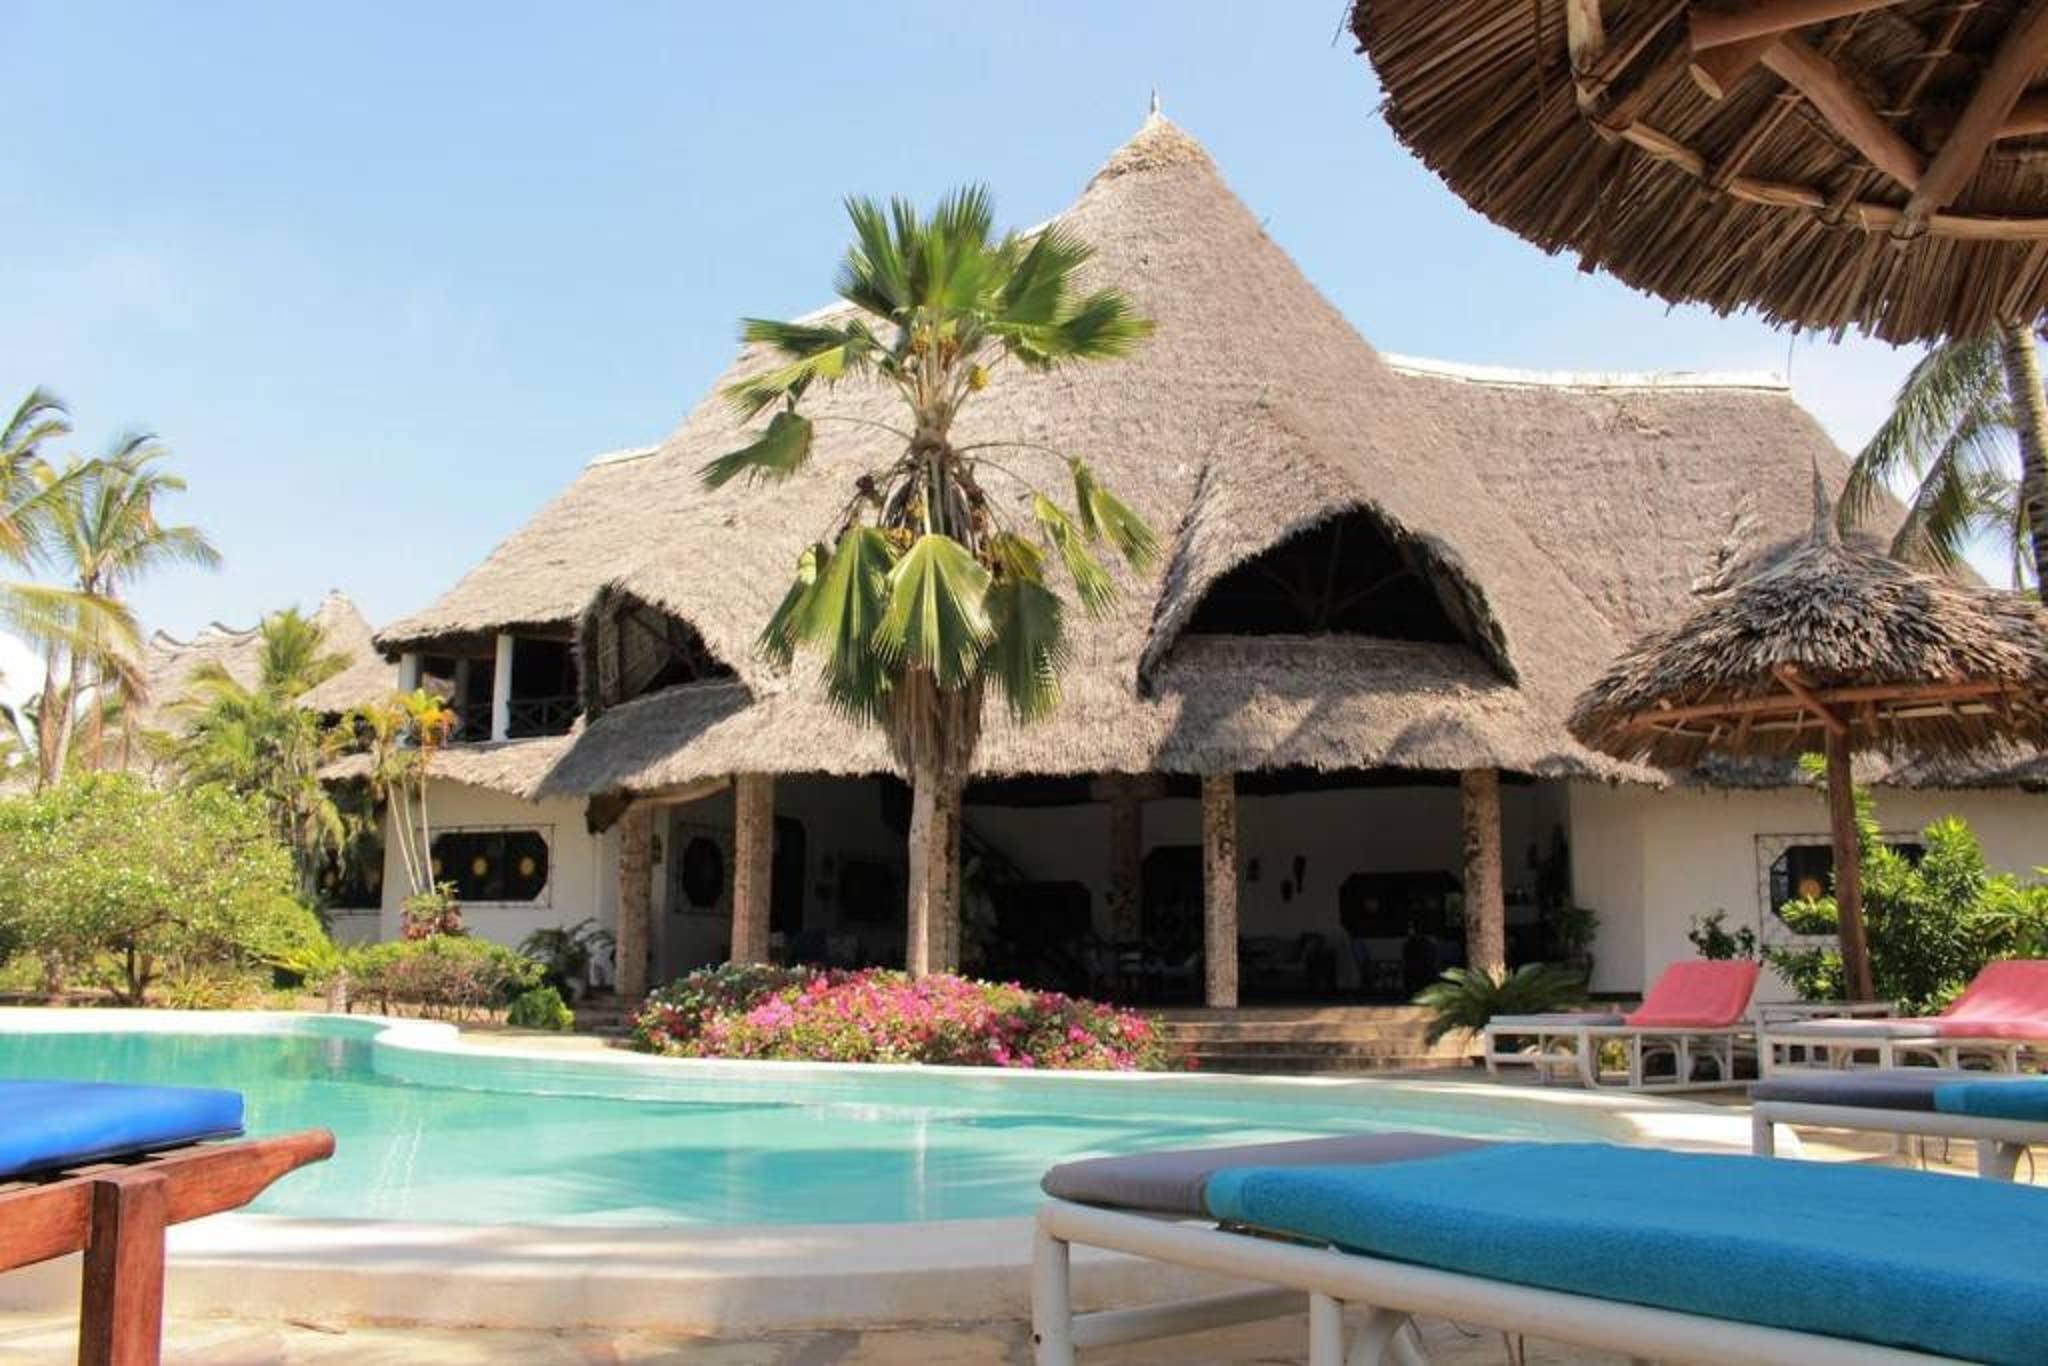 Strandlage Luxusvilla Villa in Kenia